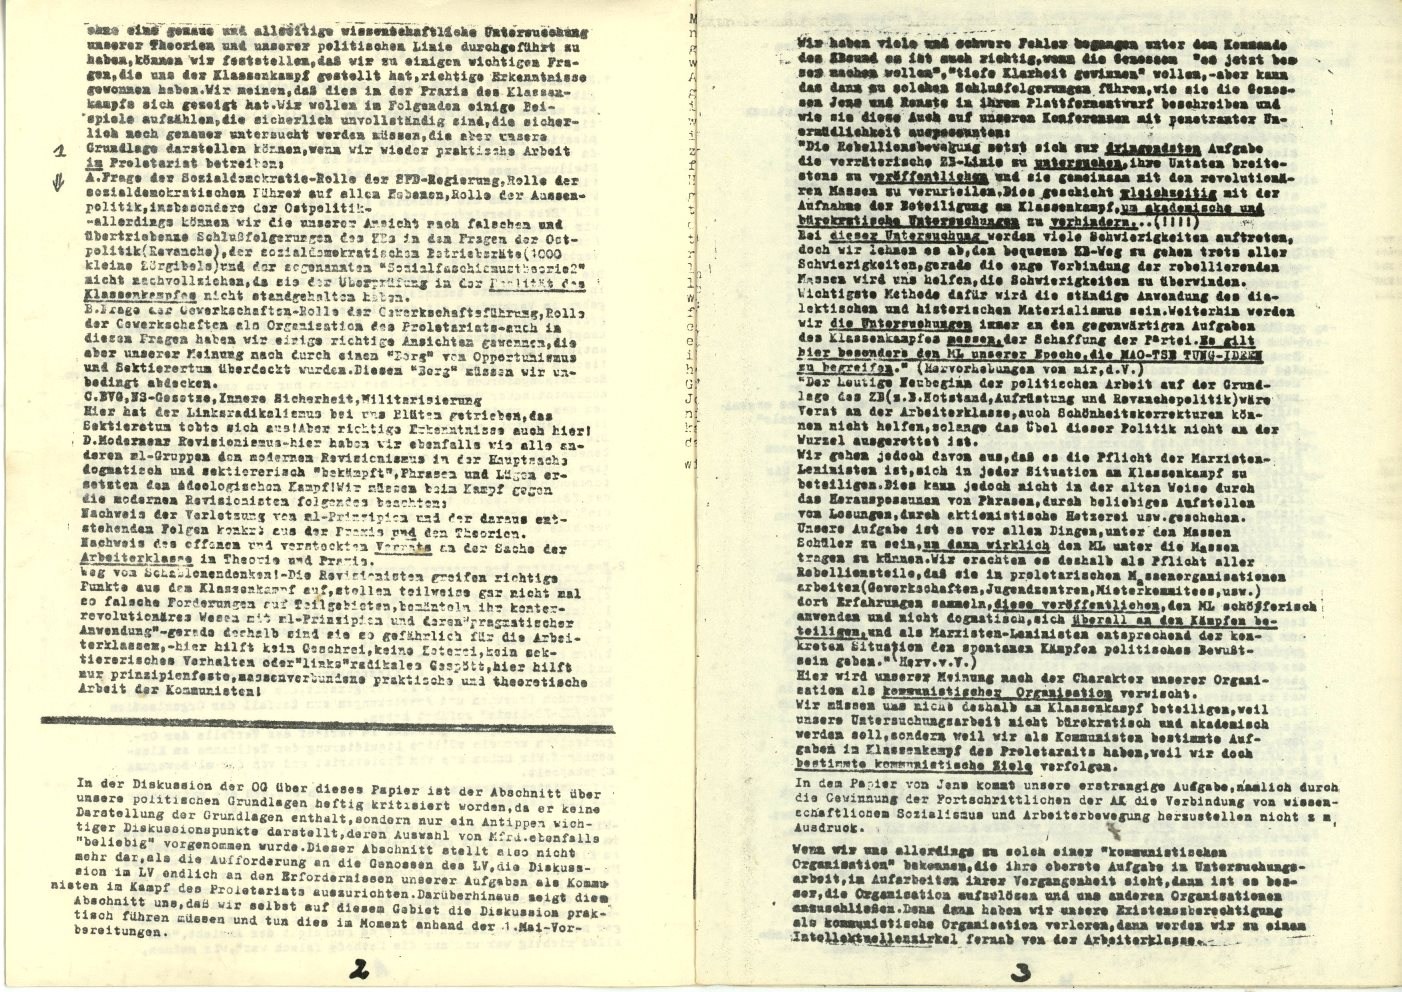 ZB_Rebellionsbewegung_Diskussionsorgan_19730419_03